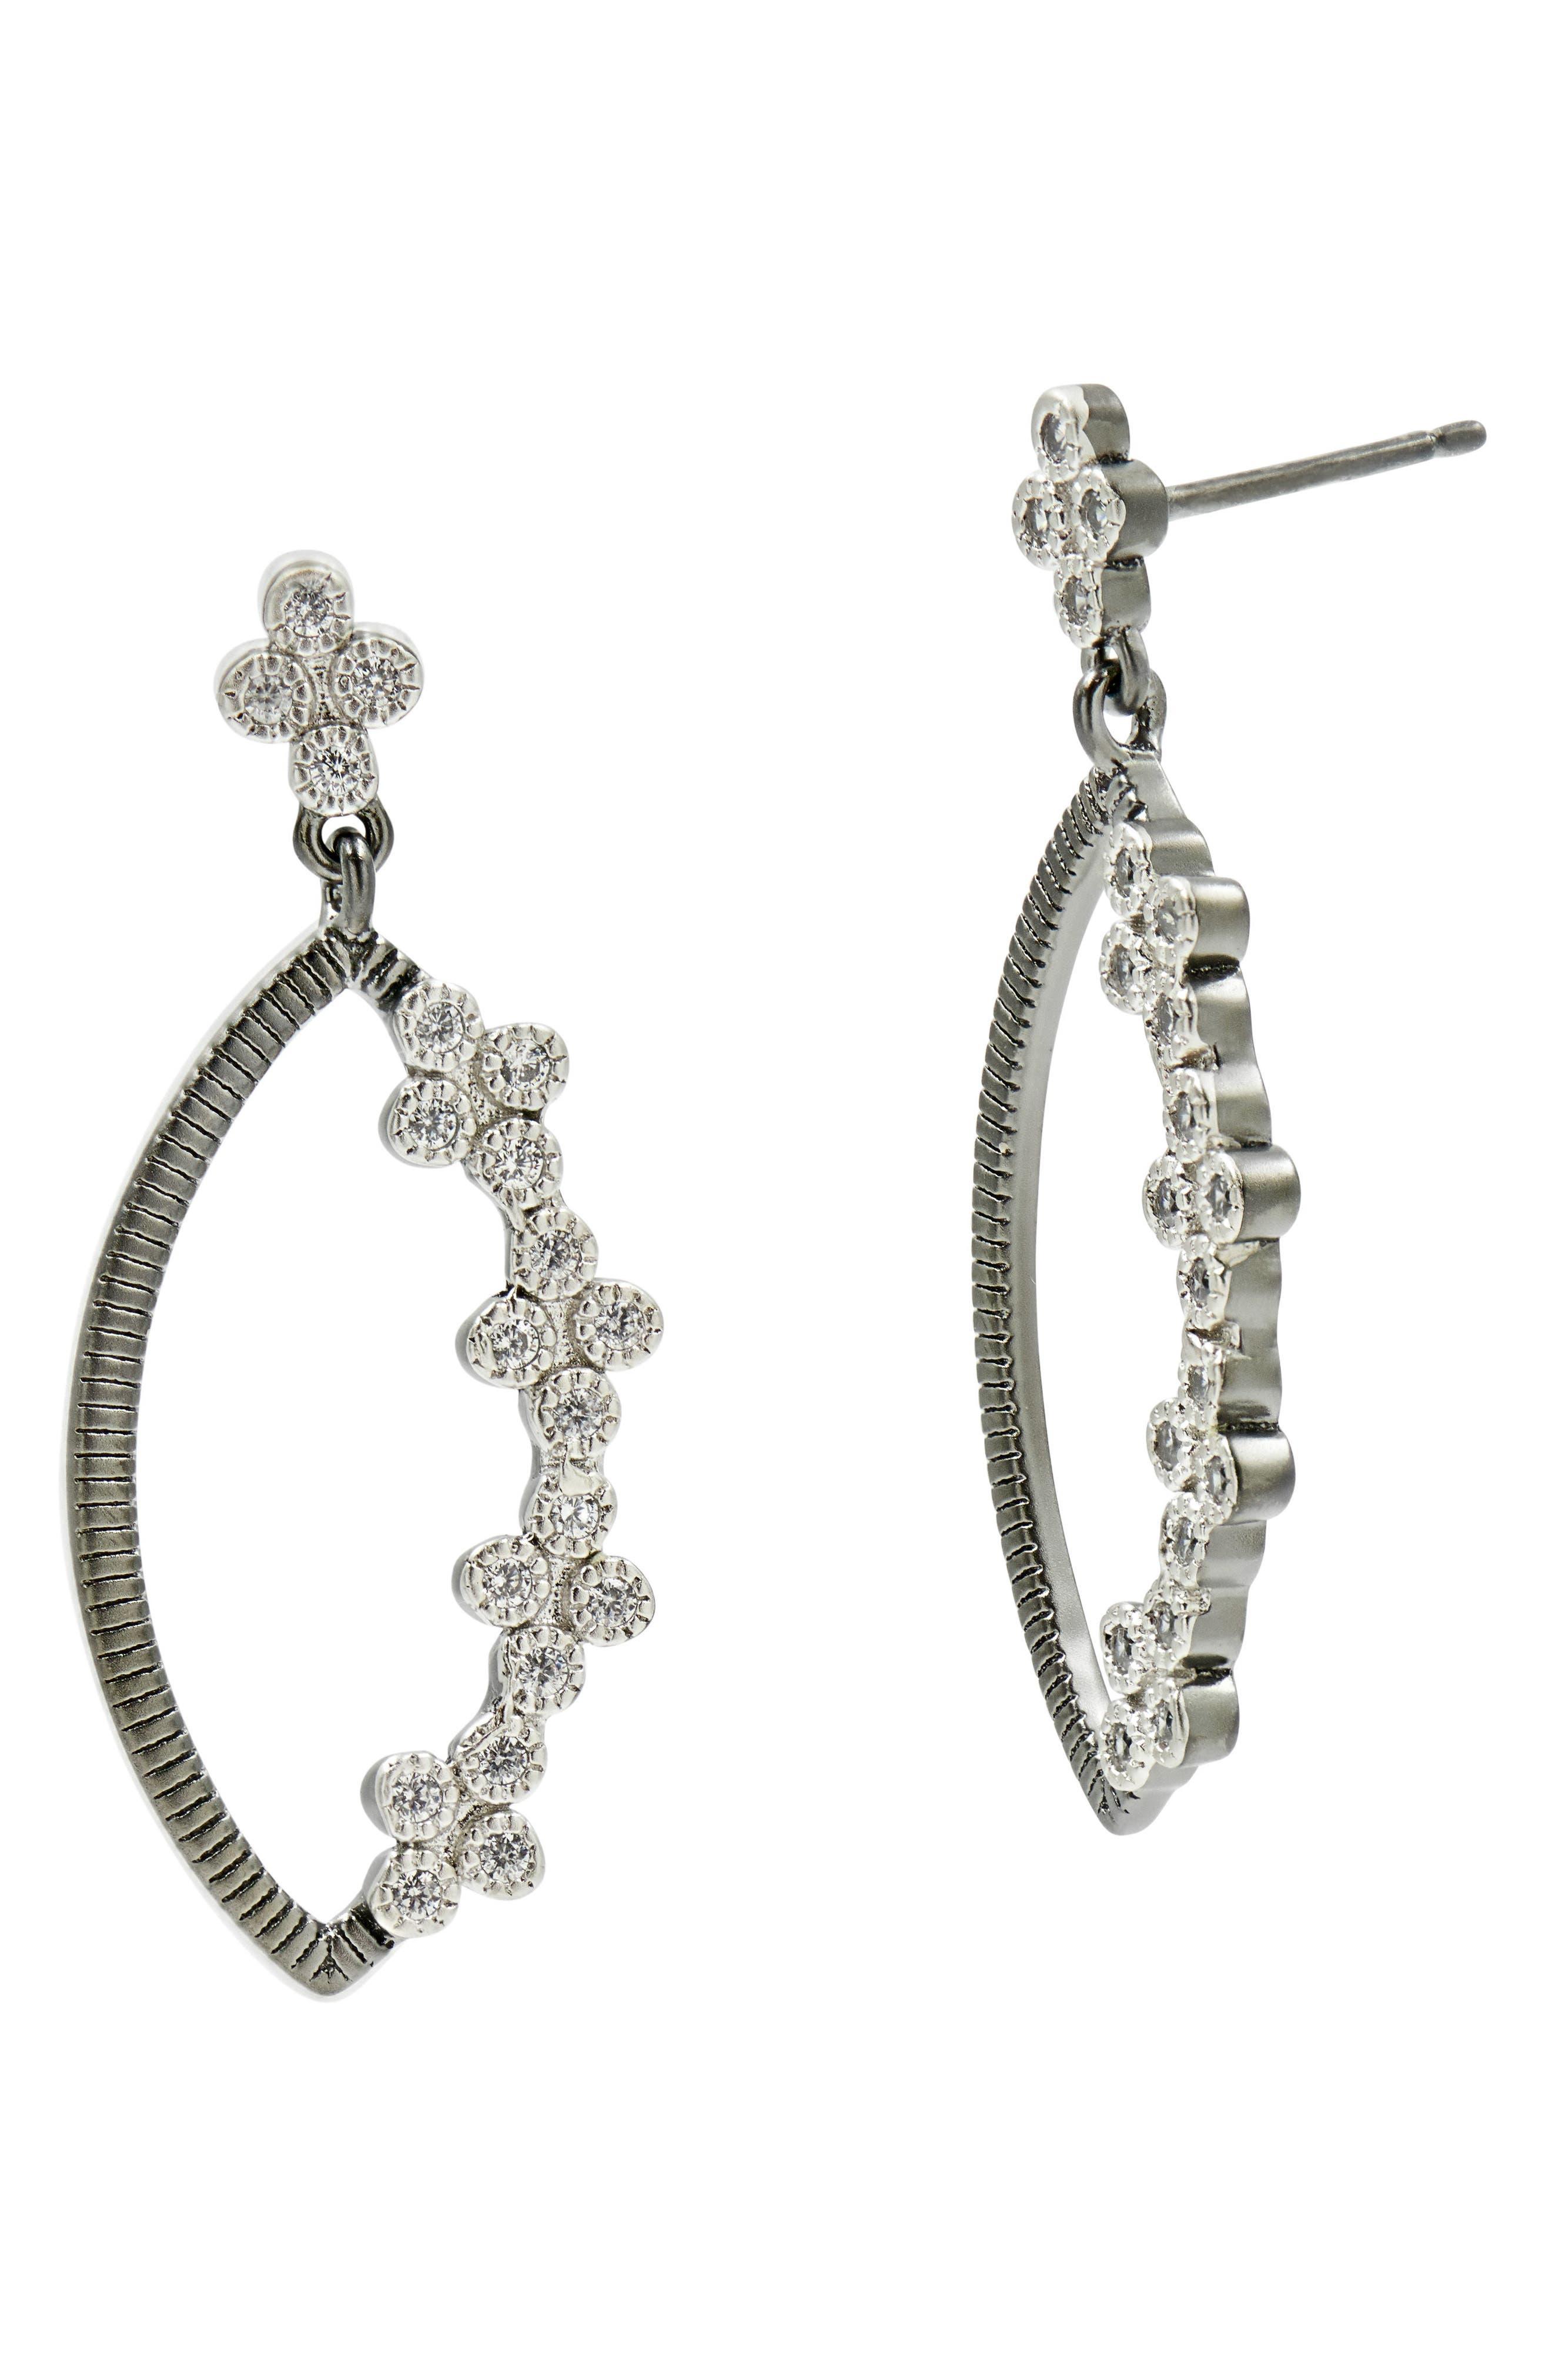 Main Image - FREIDA ROTHMAN Industrial Finish Marquise Drop Earrings